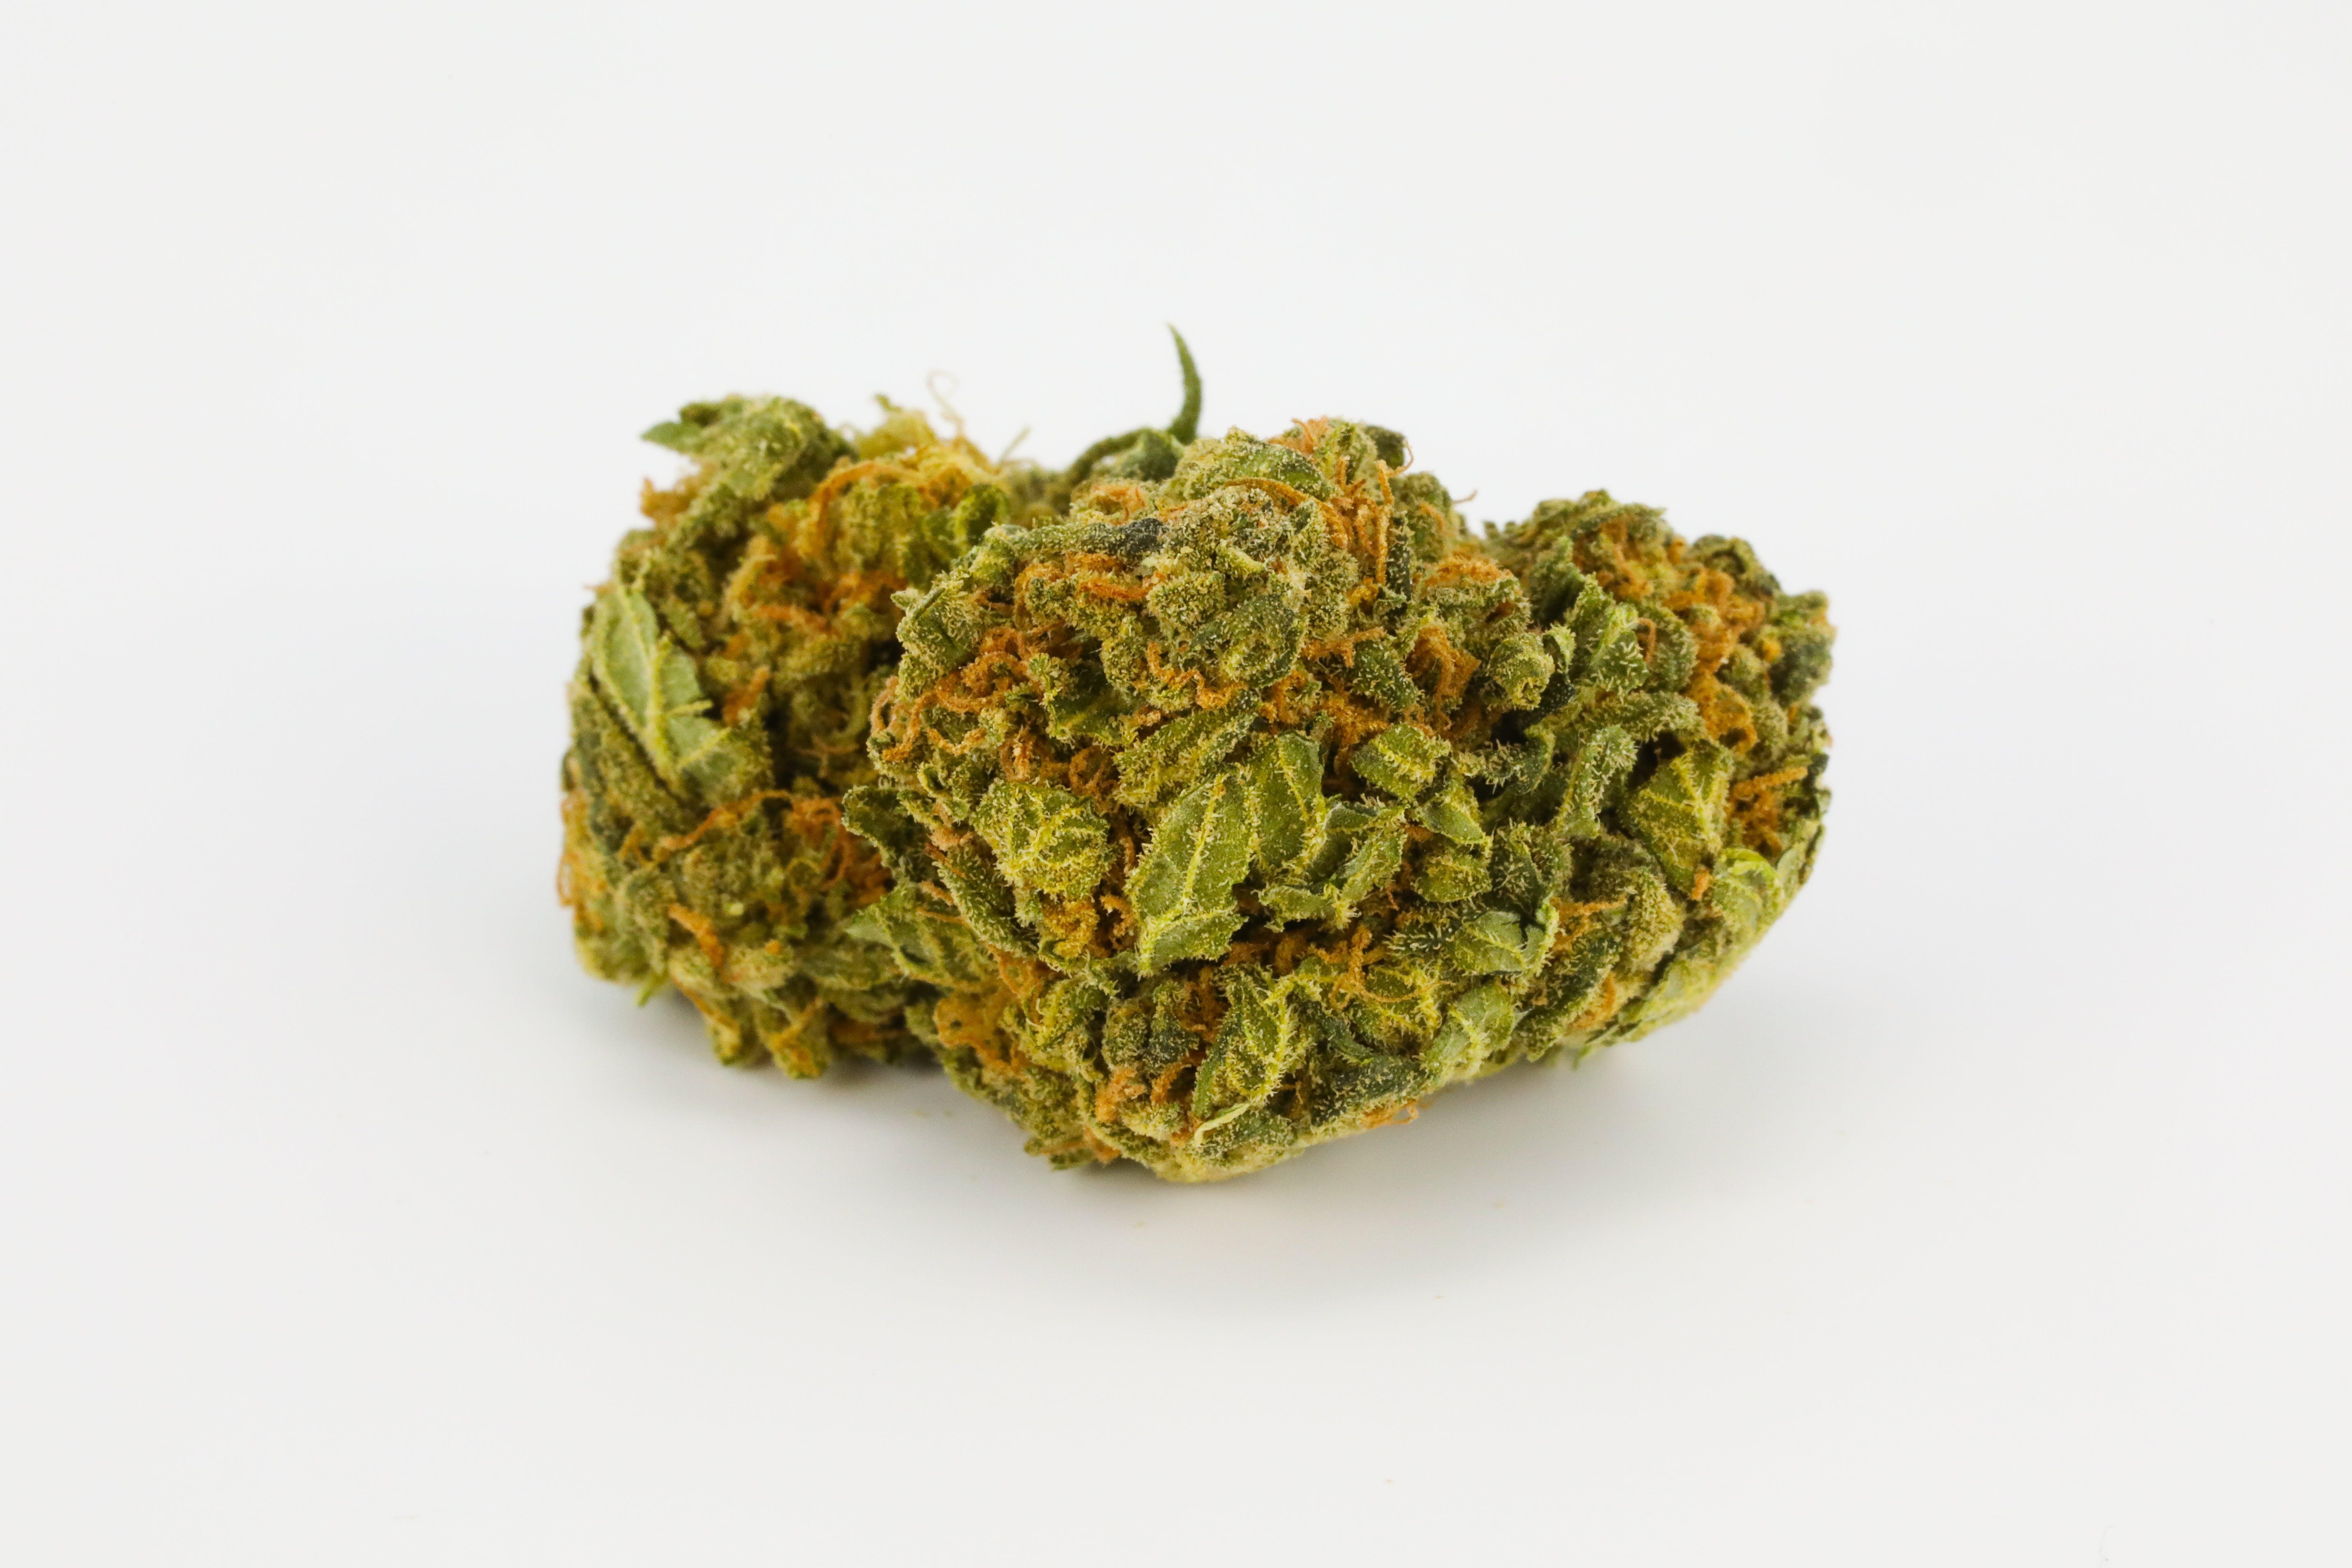 Mazar I Sharif Weed; Mazar I Sharif Cannabis Strain; Mazar I Sharif Indica Marijuana Strain